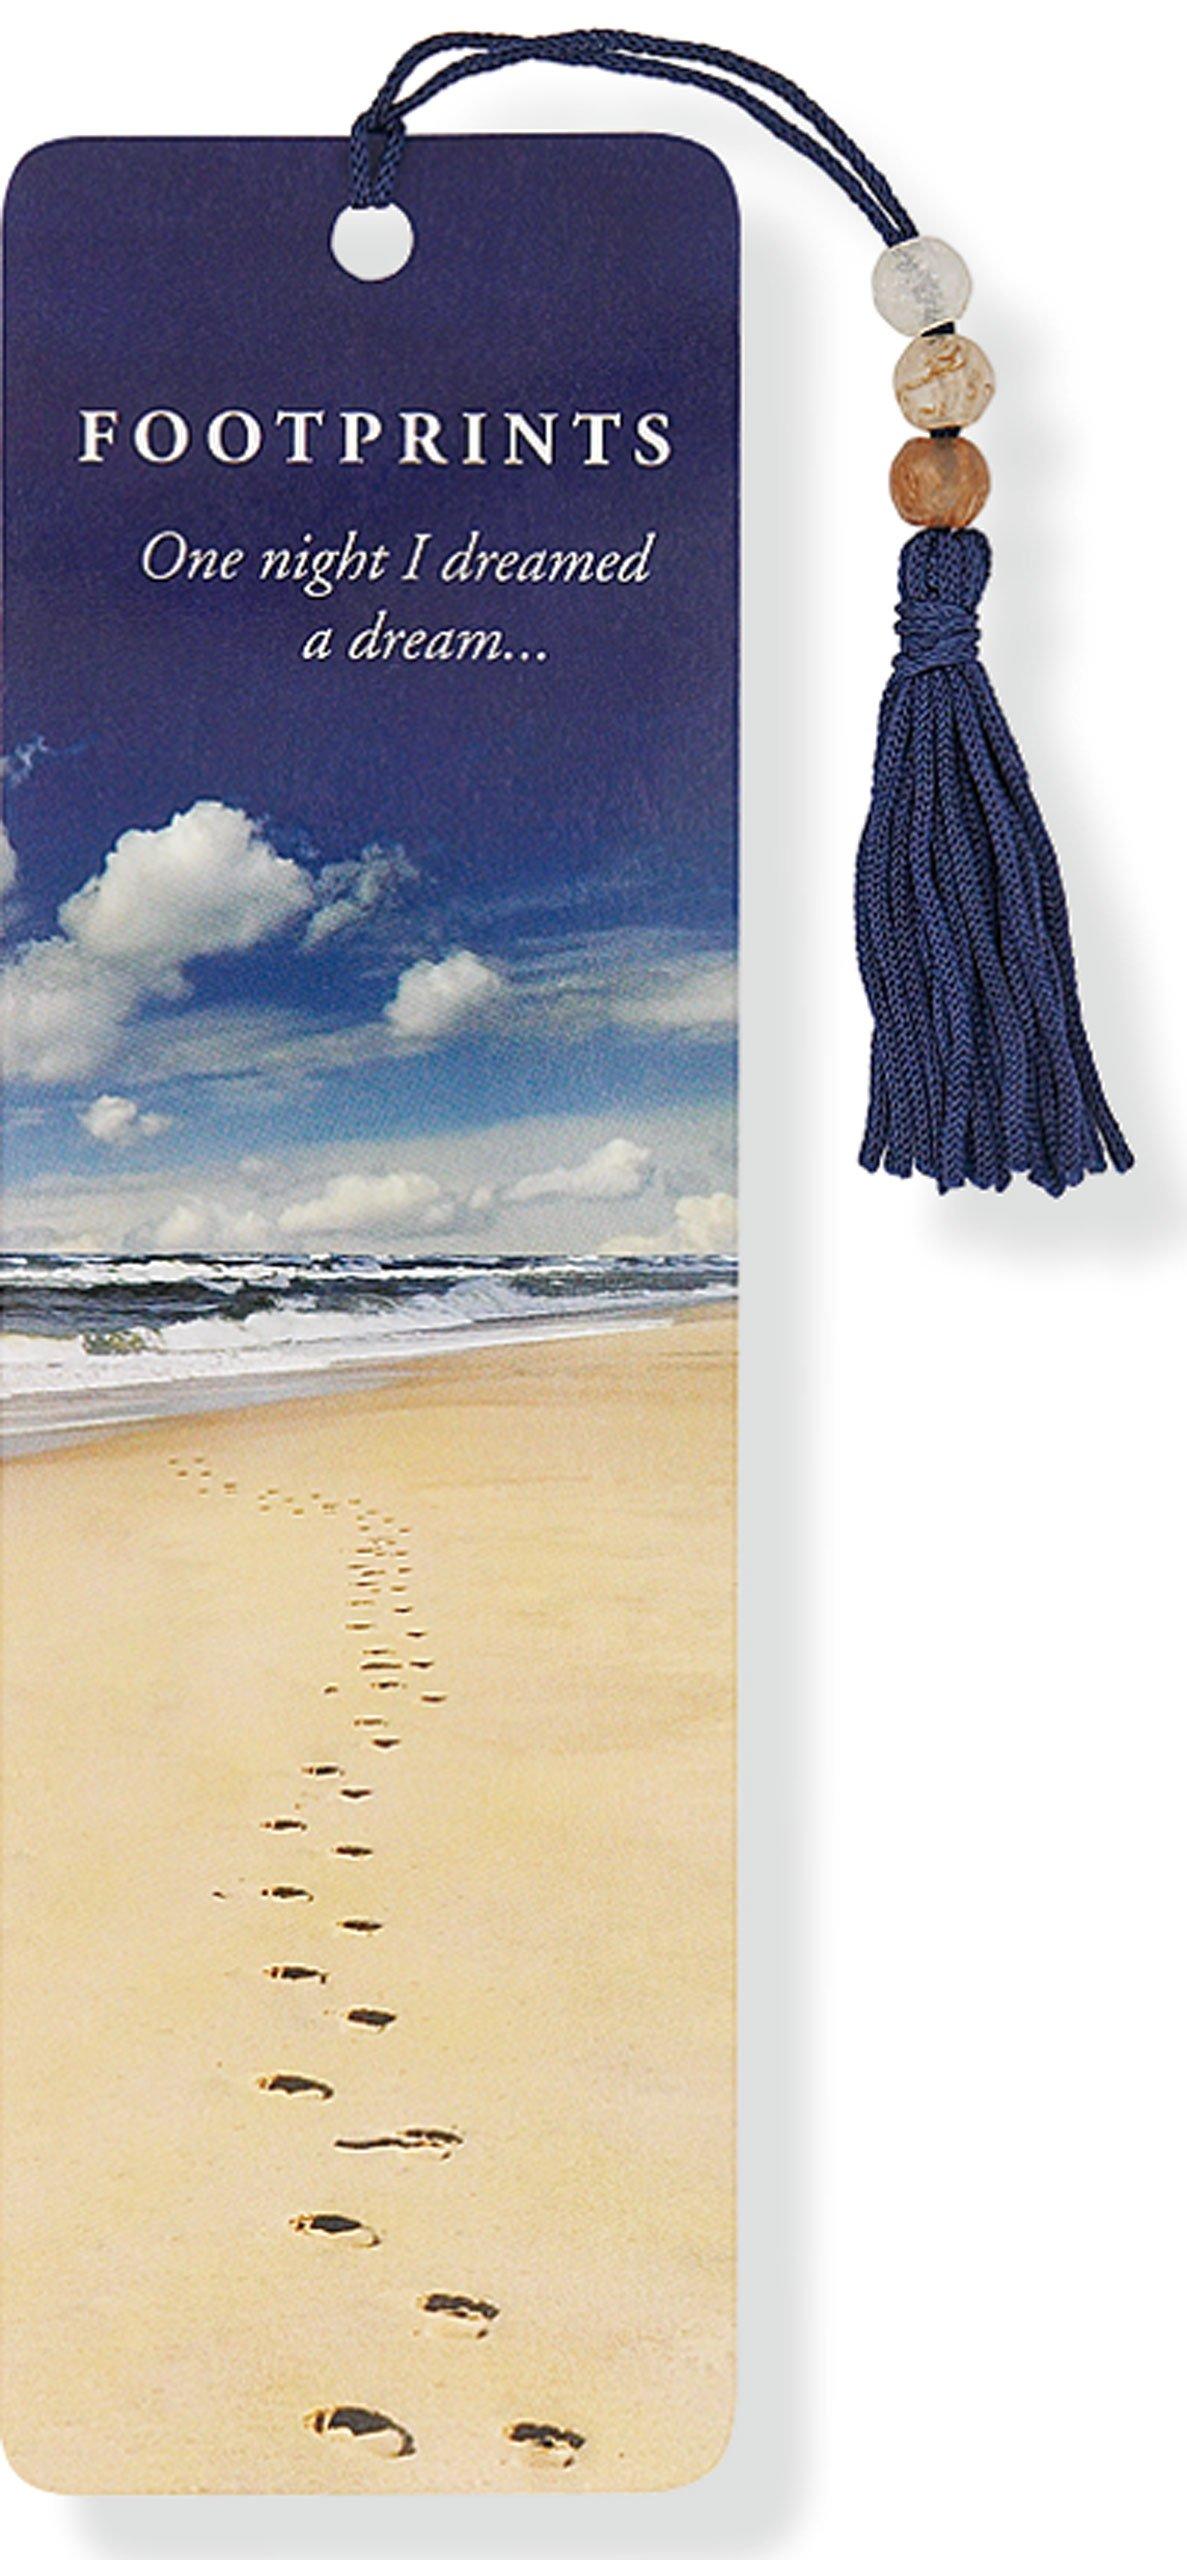 Footprints Beaded Bookmark Misc. Supplies – Jan 1 2009 Peter Pauper Press 1593593244 Nonfiction / Non-Classifiable